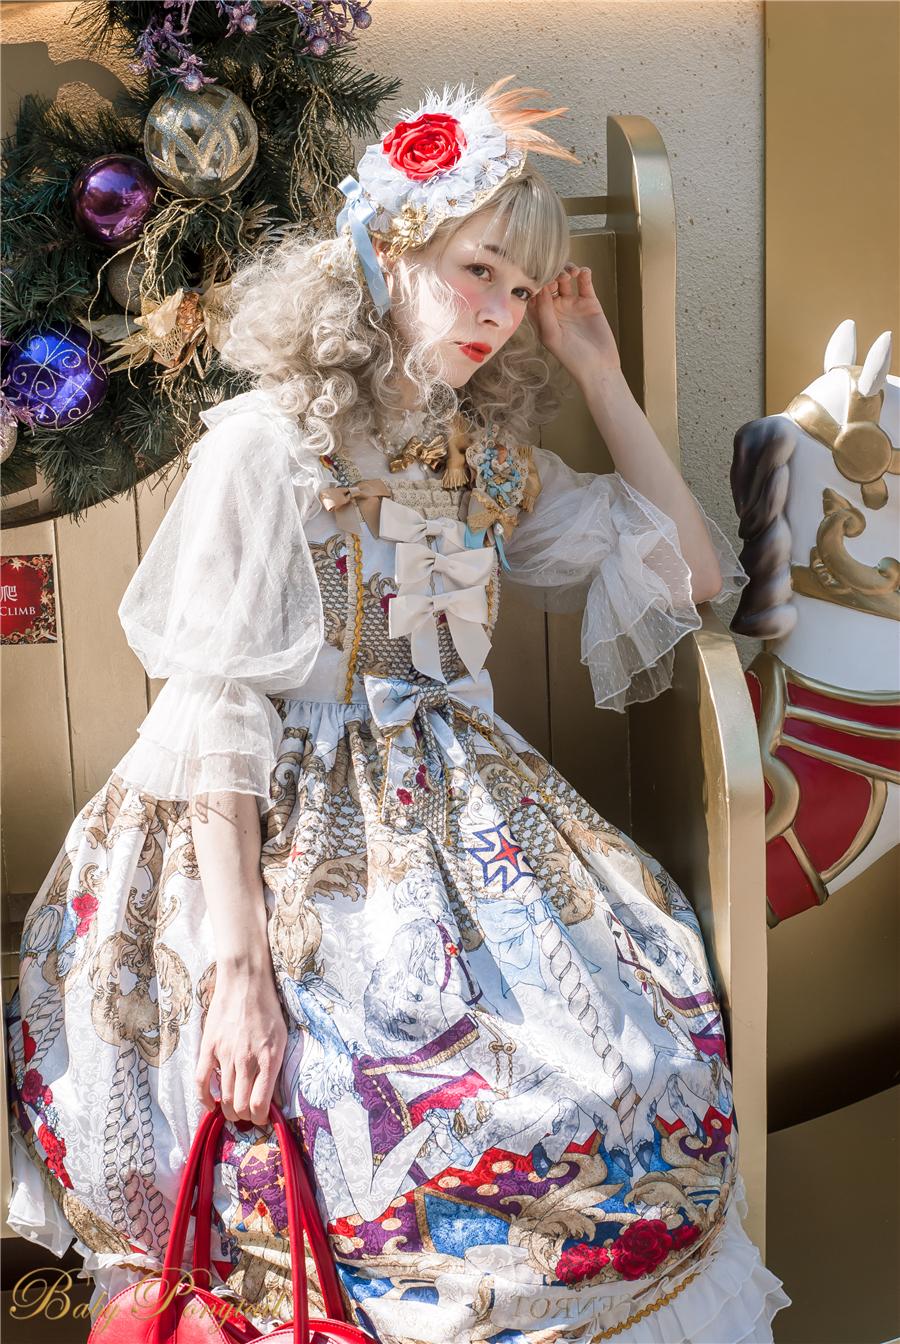 Baby Ponytail_Circus Princess_Silver JSK_Claudia02.jpg